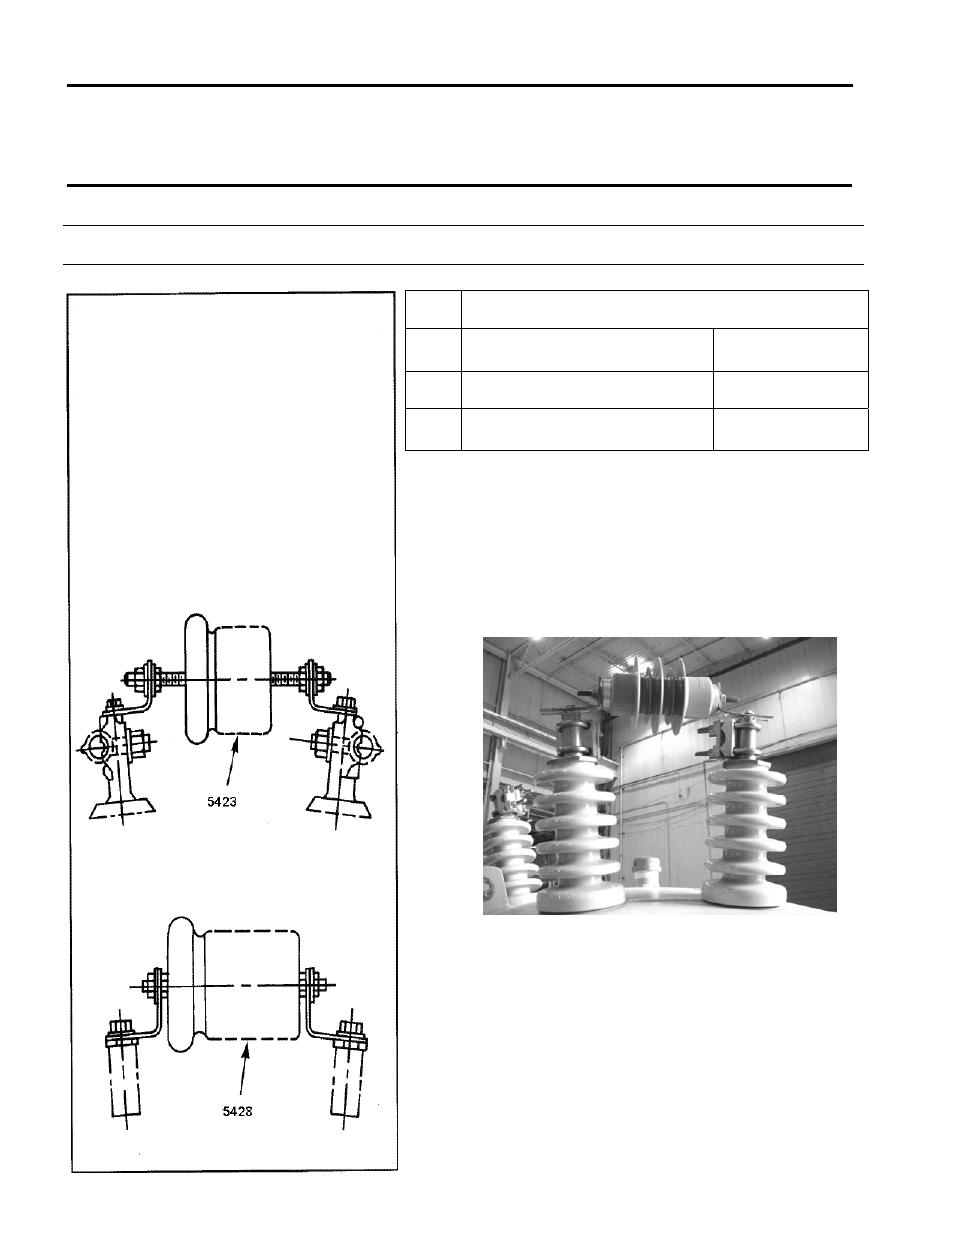 medium resolution of parts list bypass arresters siemens jfr distribution step voltage regulator 21 115532 001 user manual page 25 28